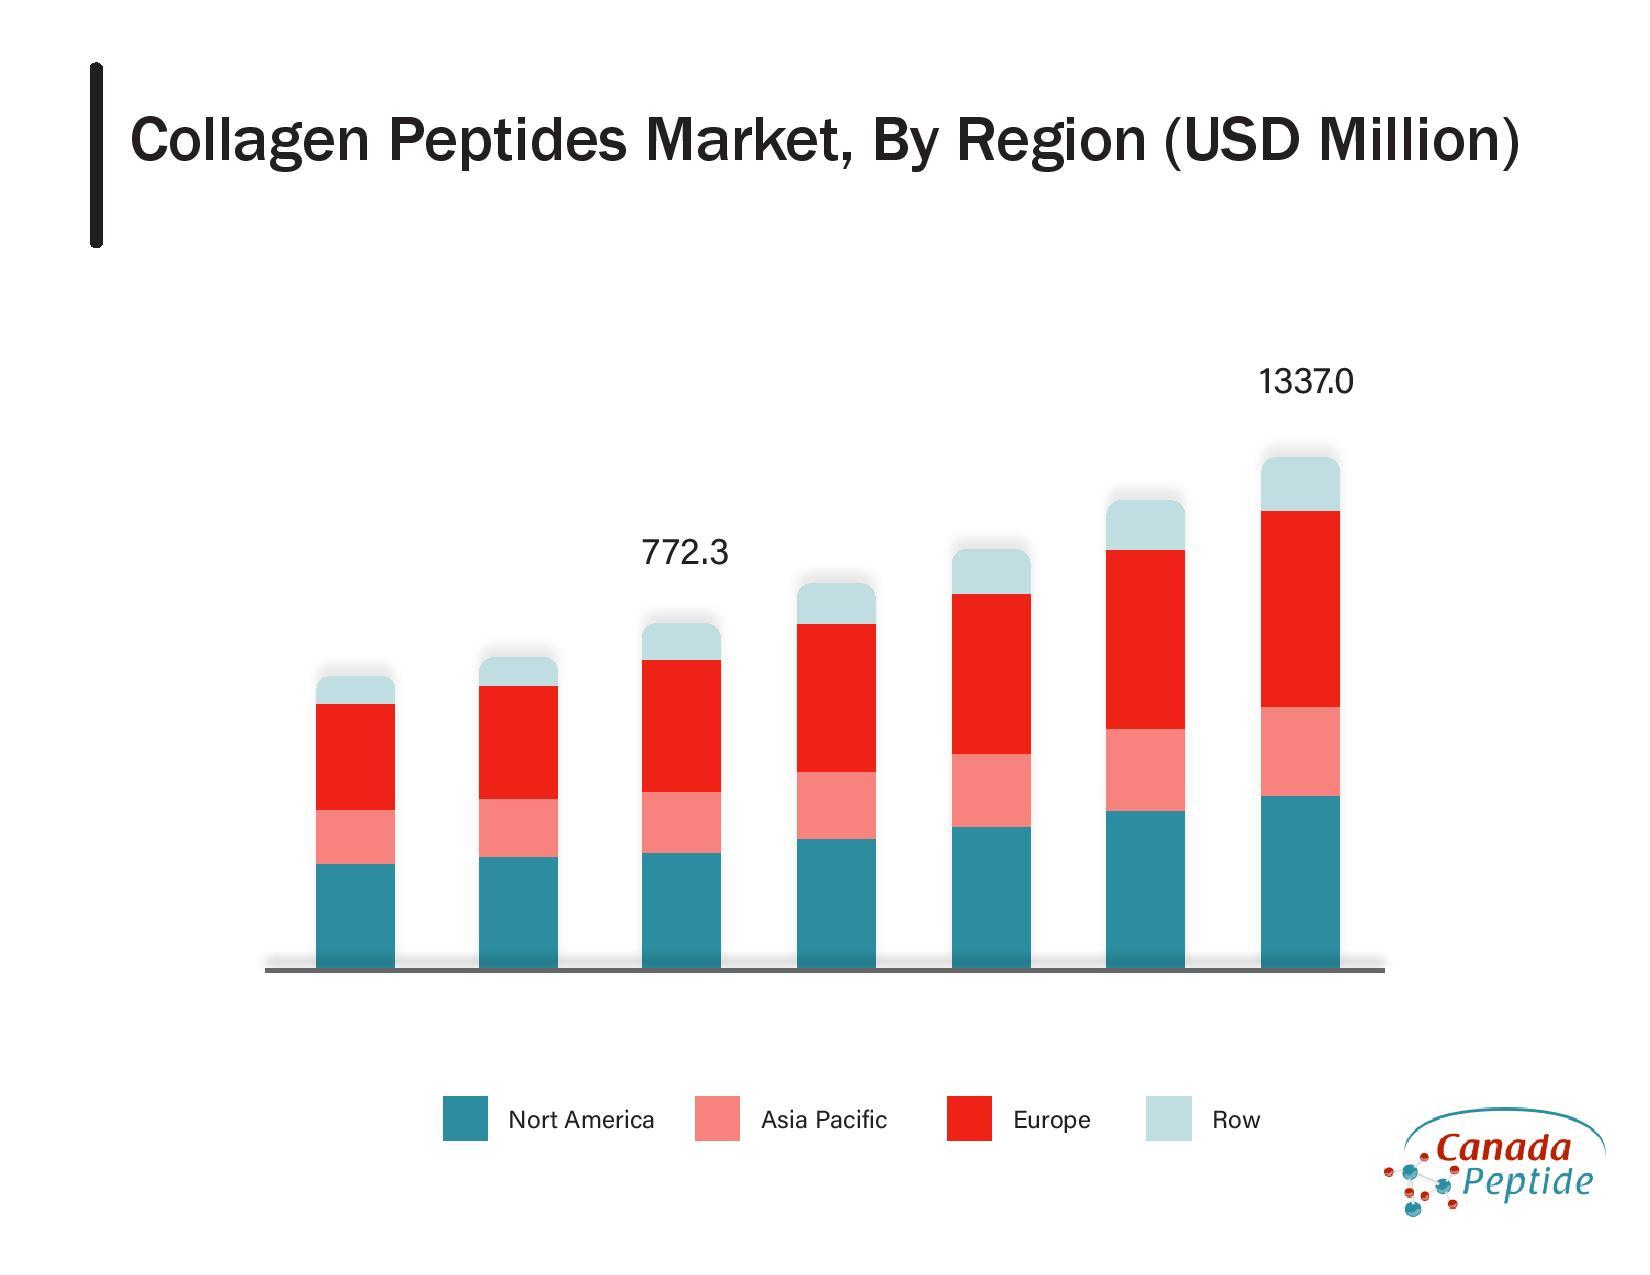 https://www.canadapeptide.com/wordpress/wp-content/uploads/2020/12/collagen-peptides.pdf